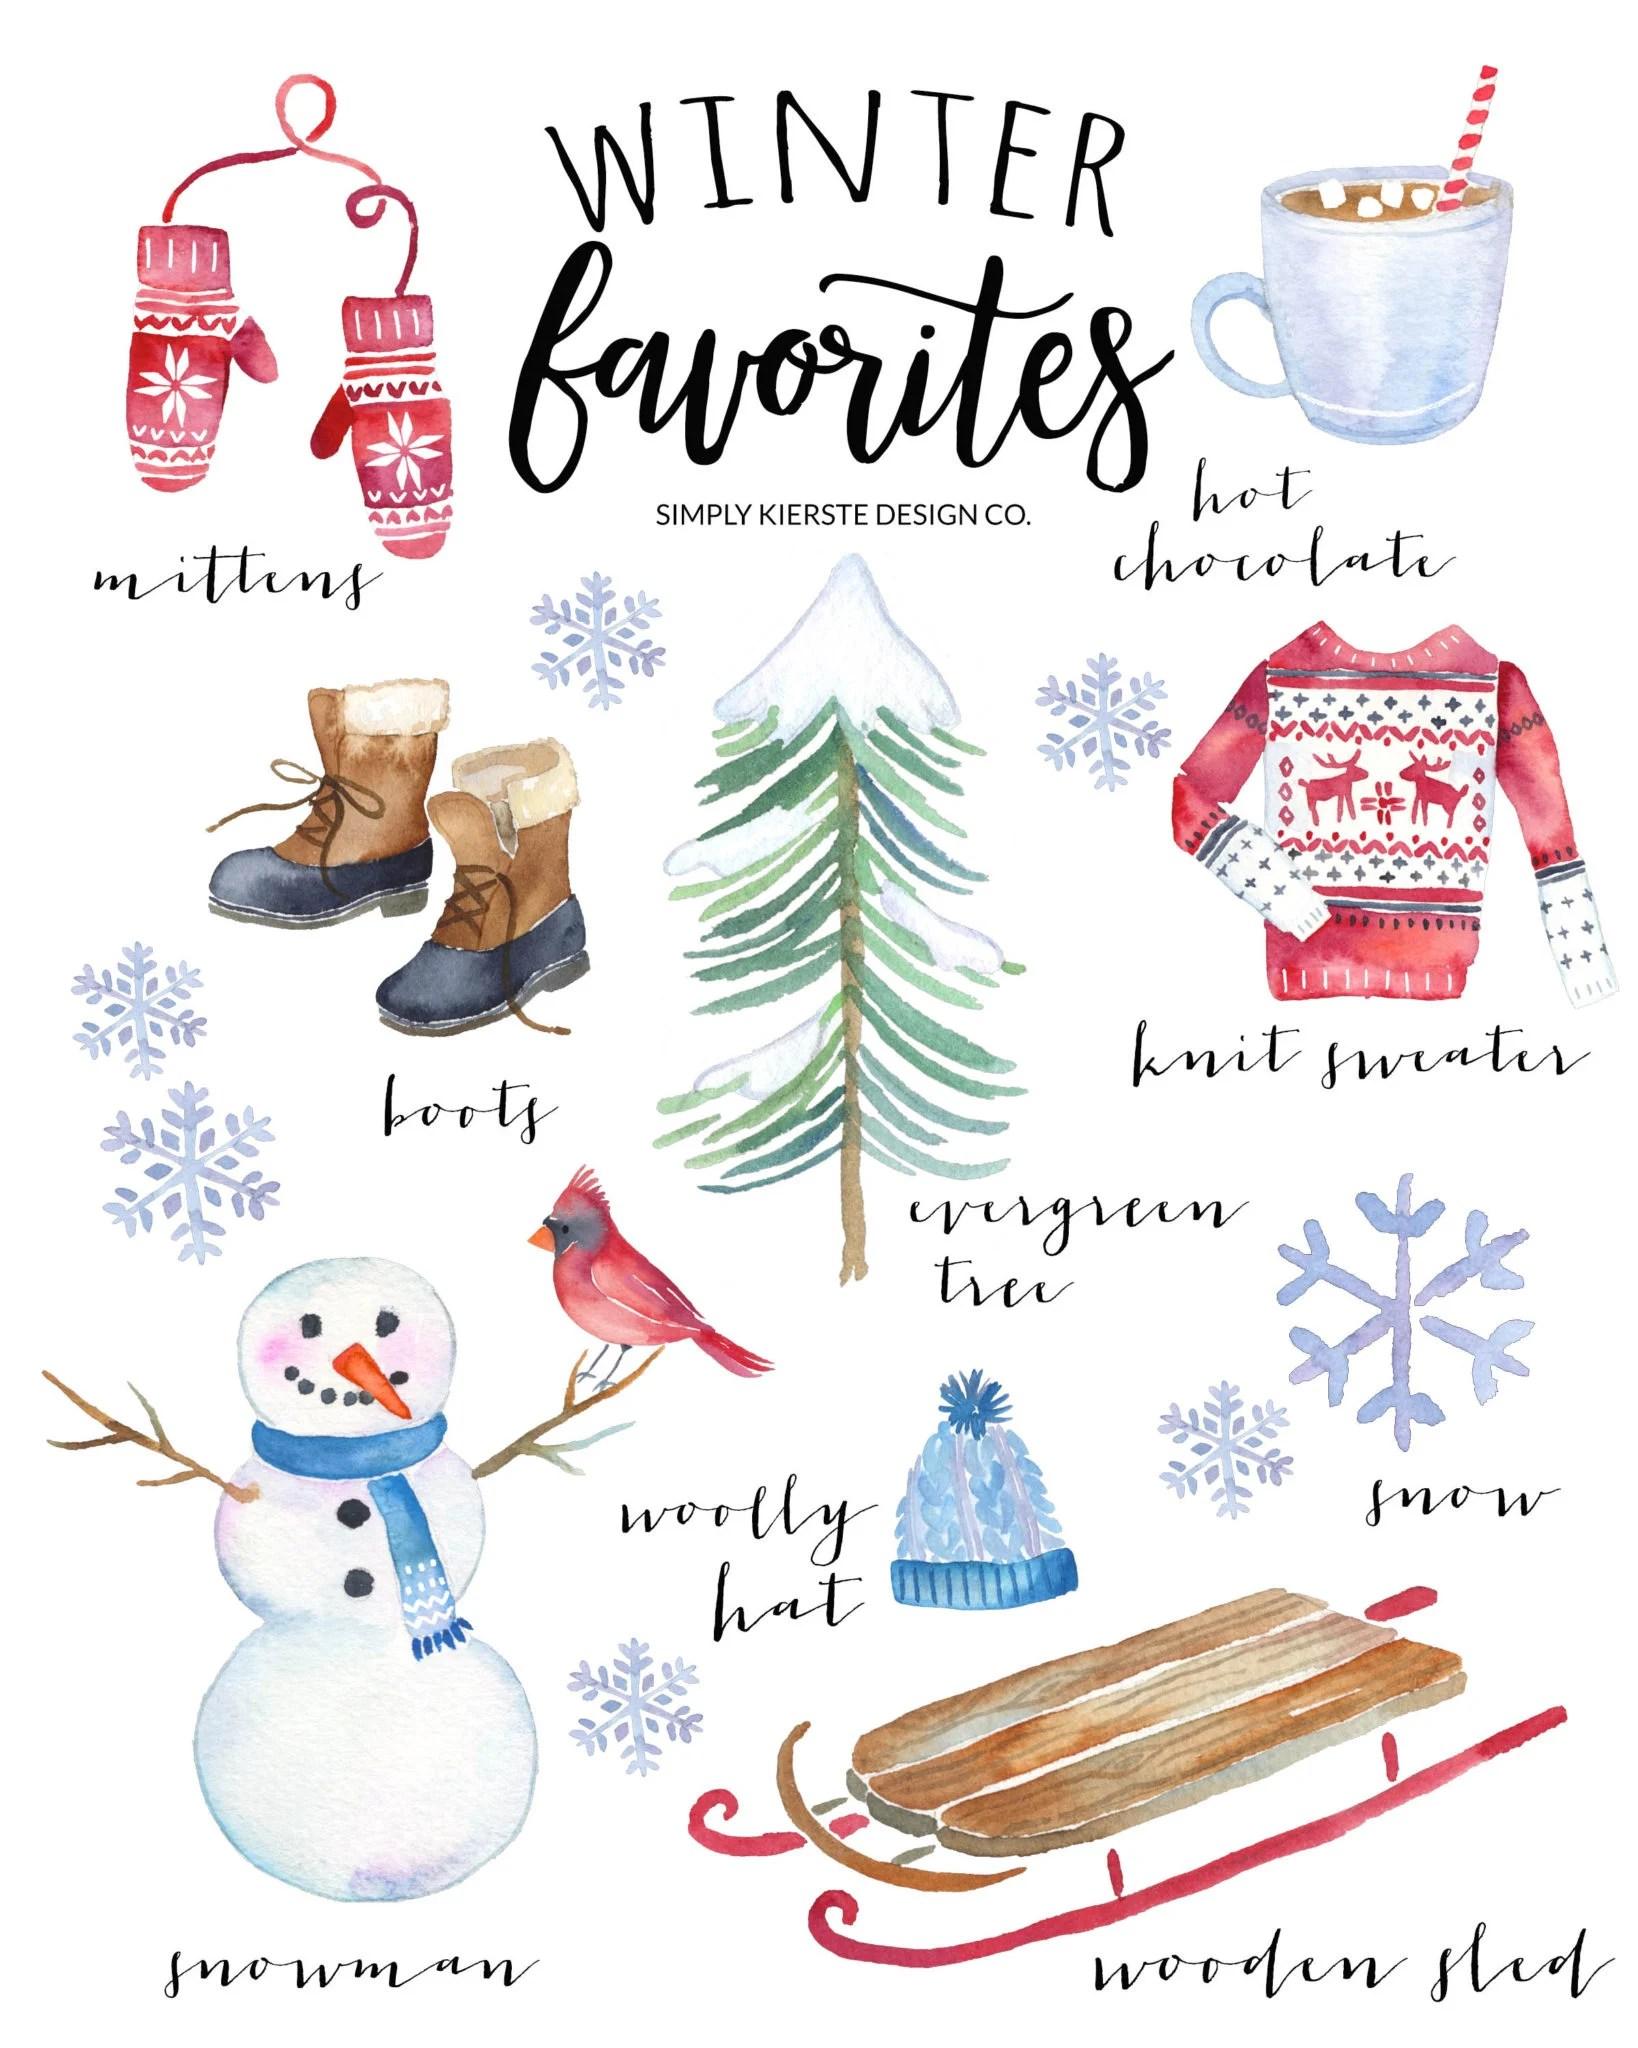 Winter Favorites Printable | Vintage Style | oldsaltfarm.com #vintageChristmas #Christmasprintable #winterfavorites #Christmasdecor